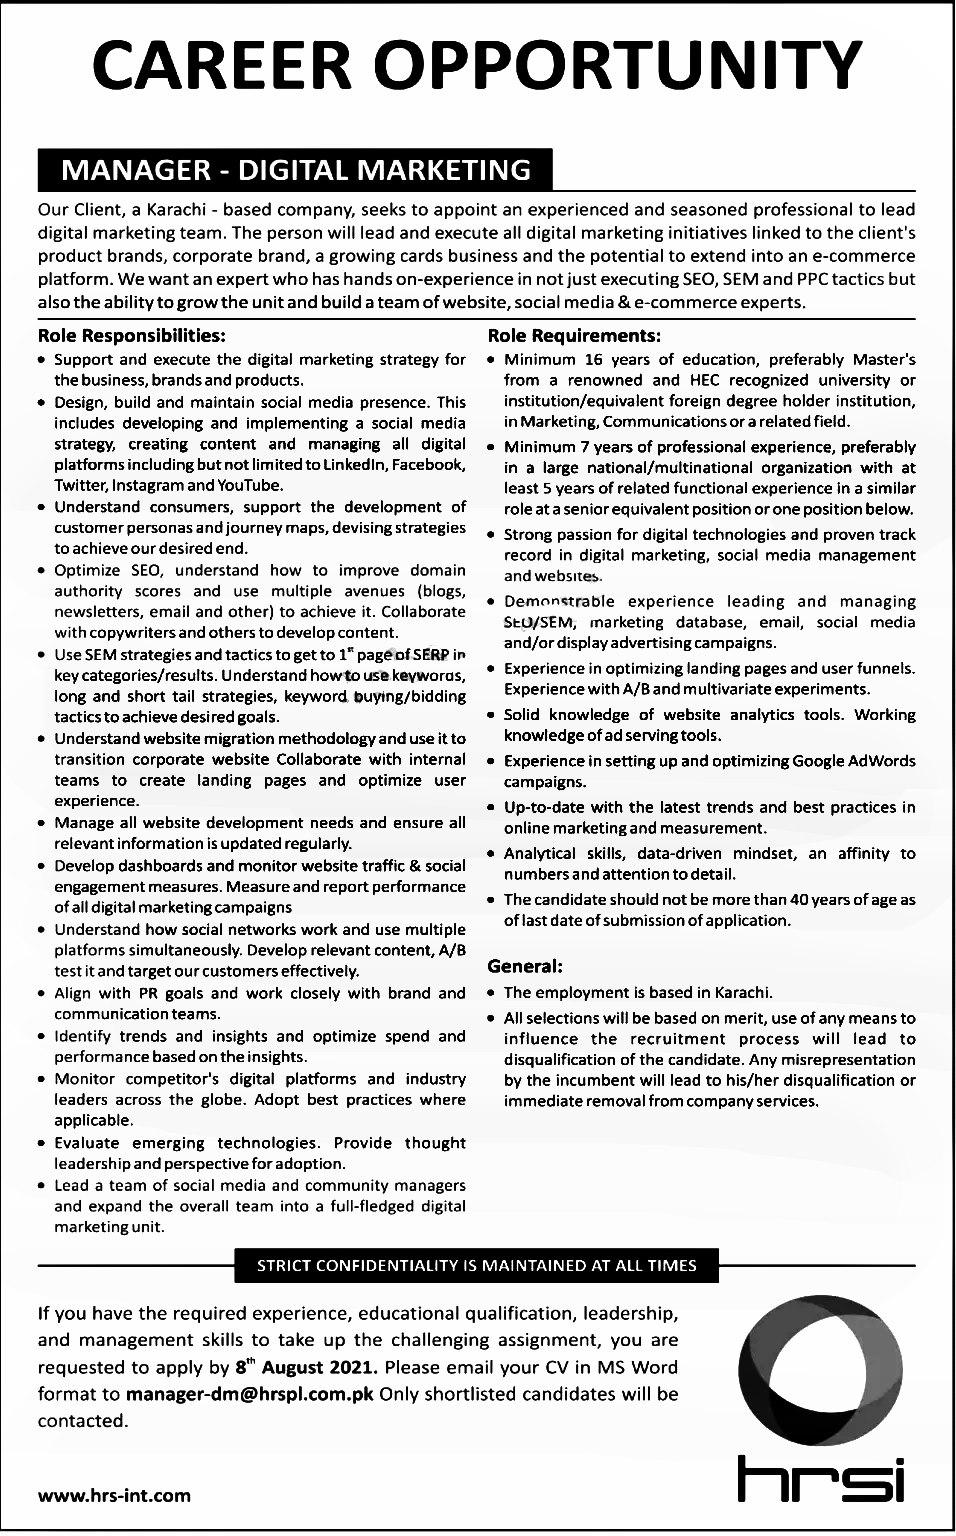 Human Resource Service Provider HRSPL Karachi Jobs 2021